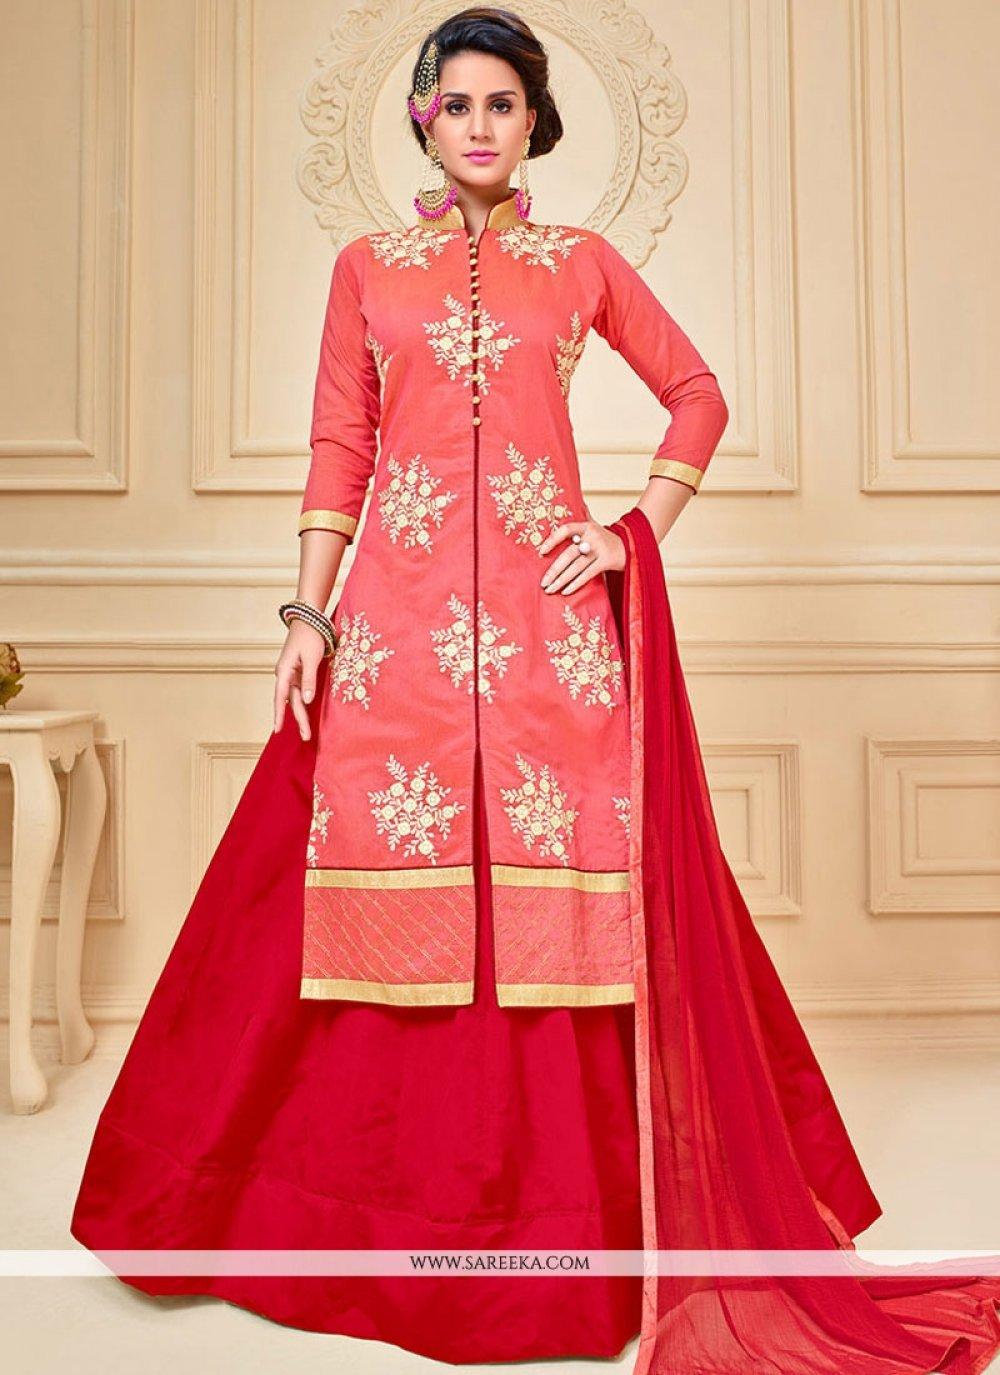 Chanderi Cotton Lace Work Long Choli Lehenga